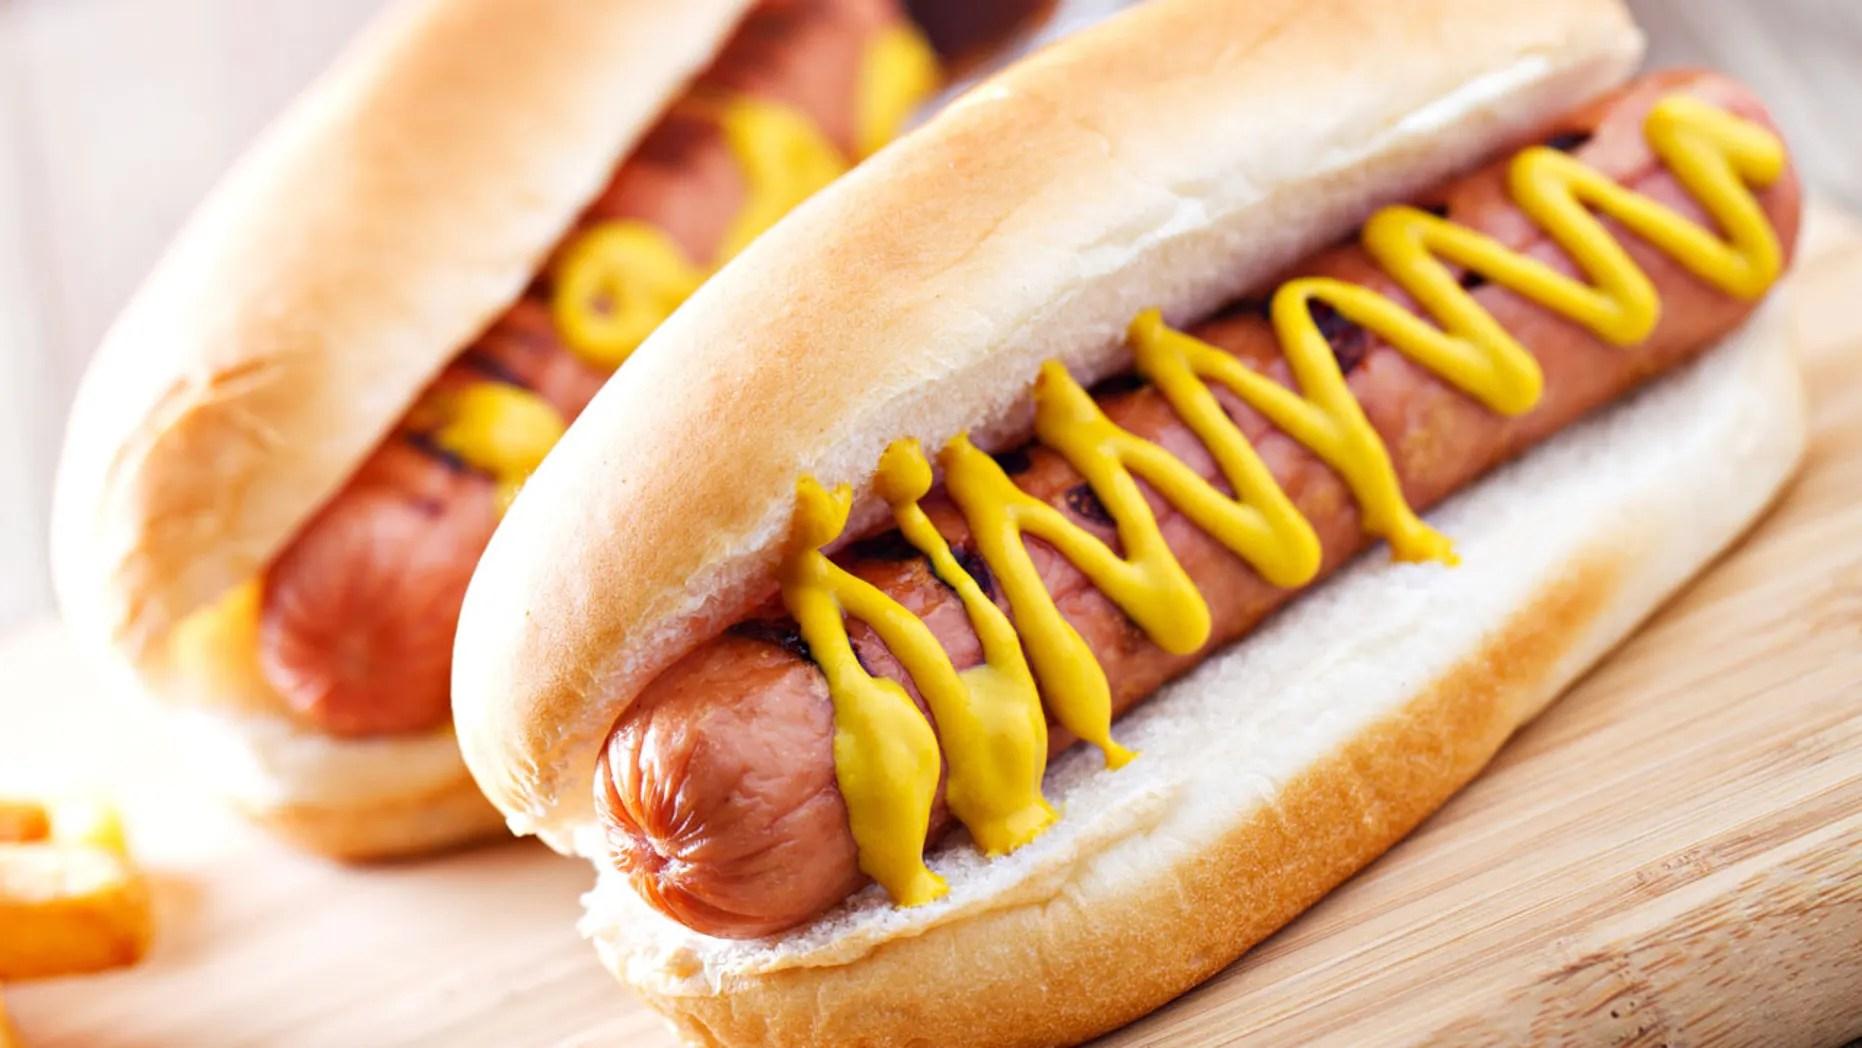 Unusual Bone Fragment Scare Forces Sabrett Hot Dog Recall Bone Fragment Scare Forces Sabrett Hot Dog Recall Fox News Hot Dog Recall May 2017 Hot Dog Recall Brands nice food Hot Dog Recall